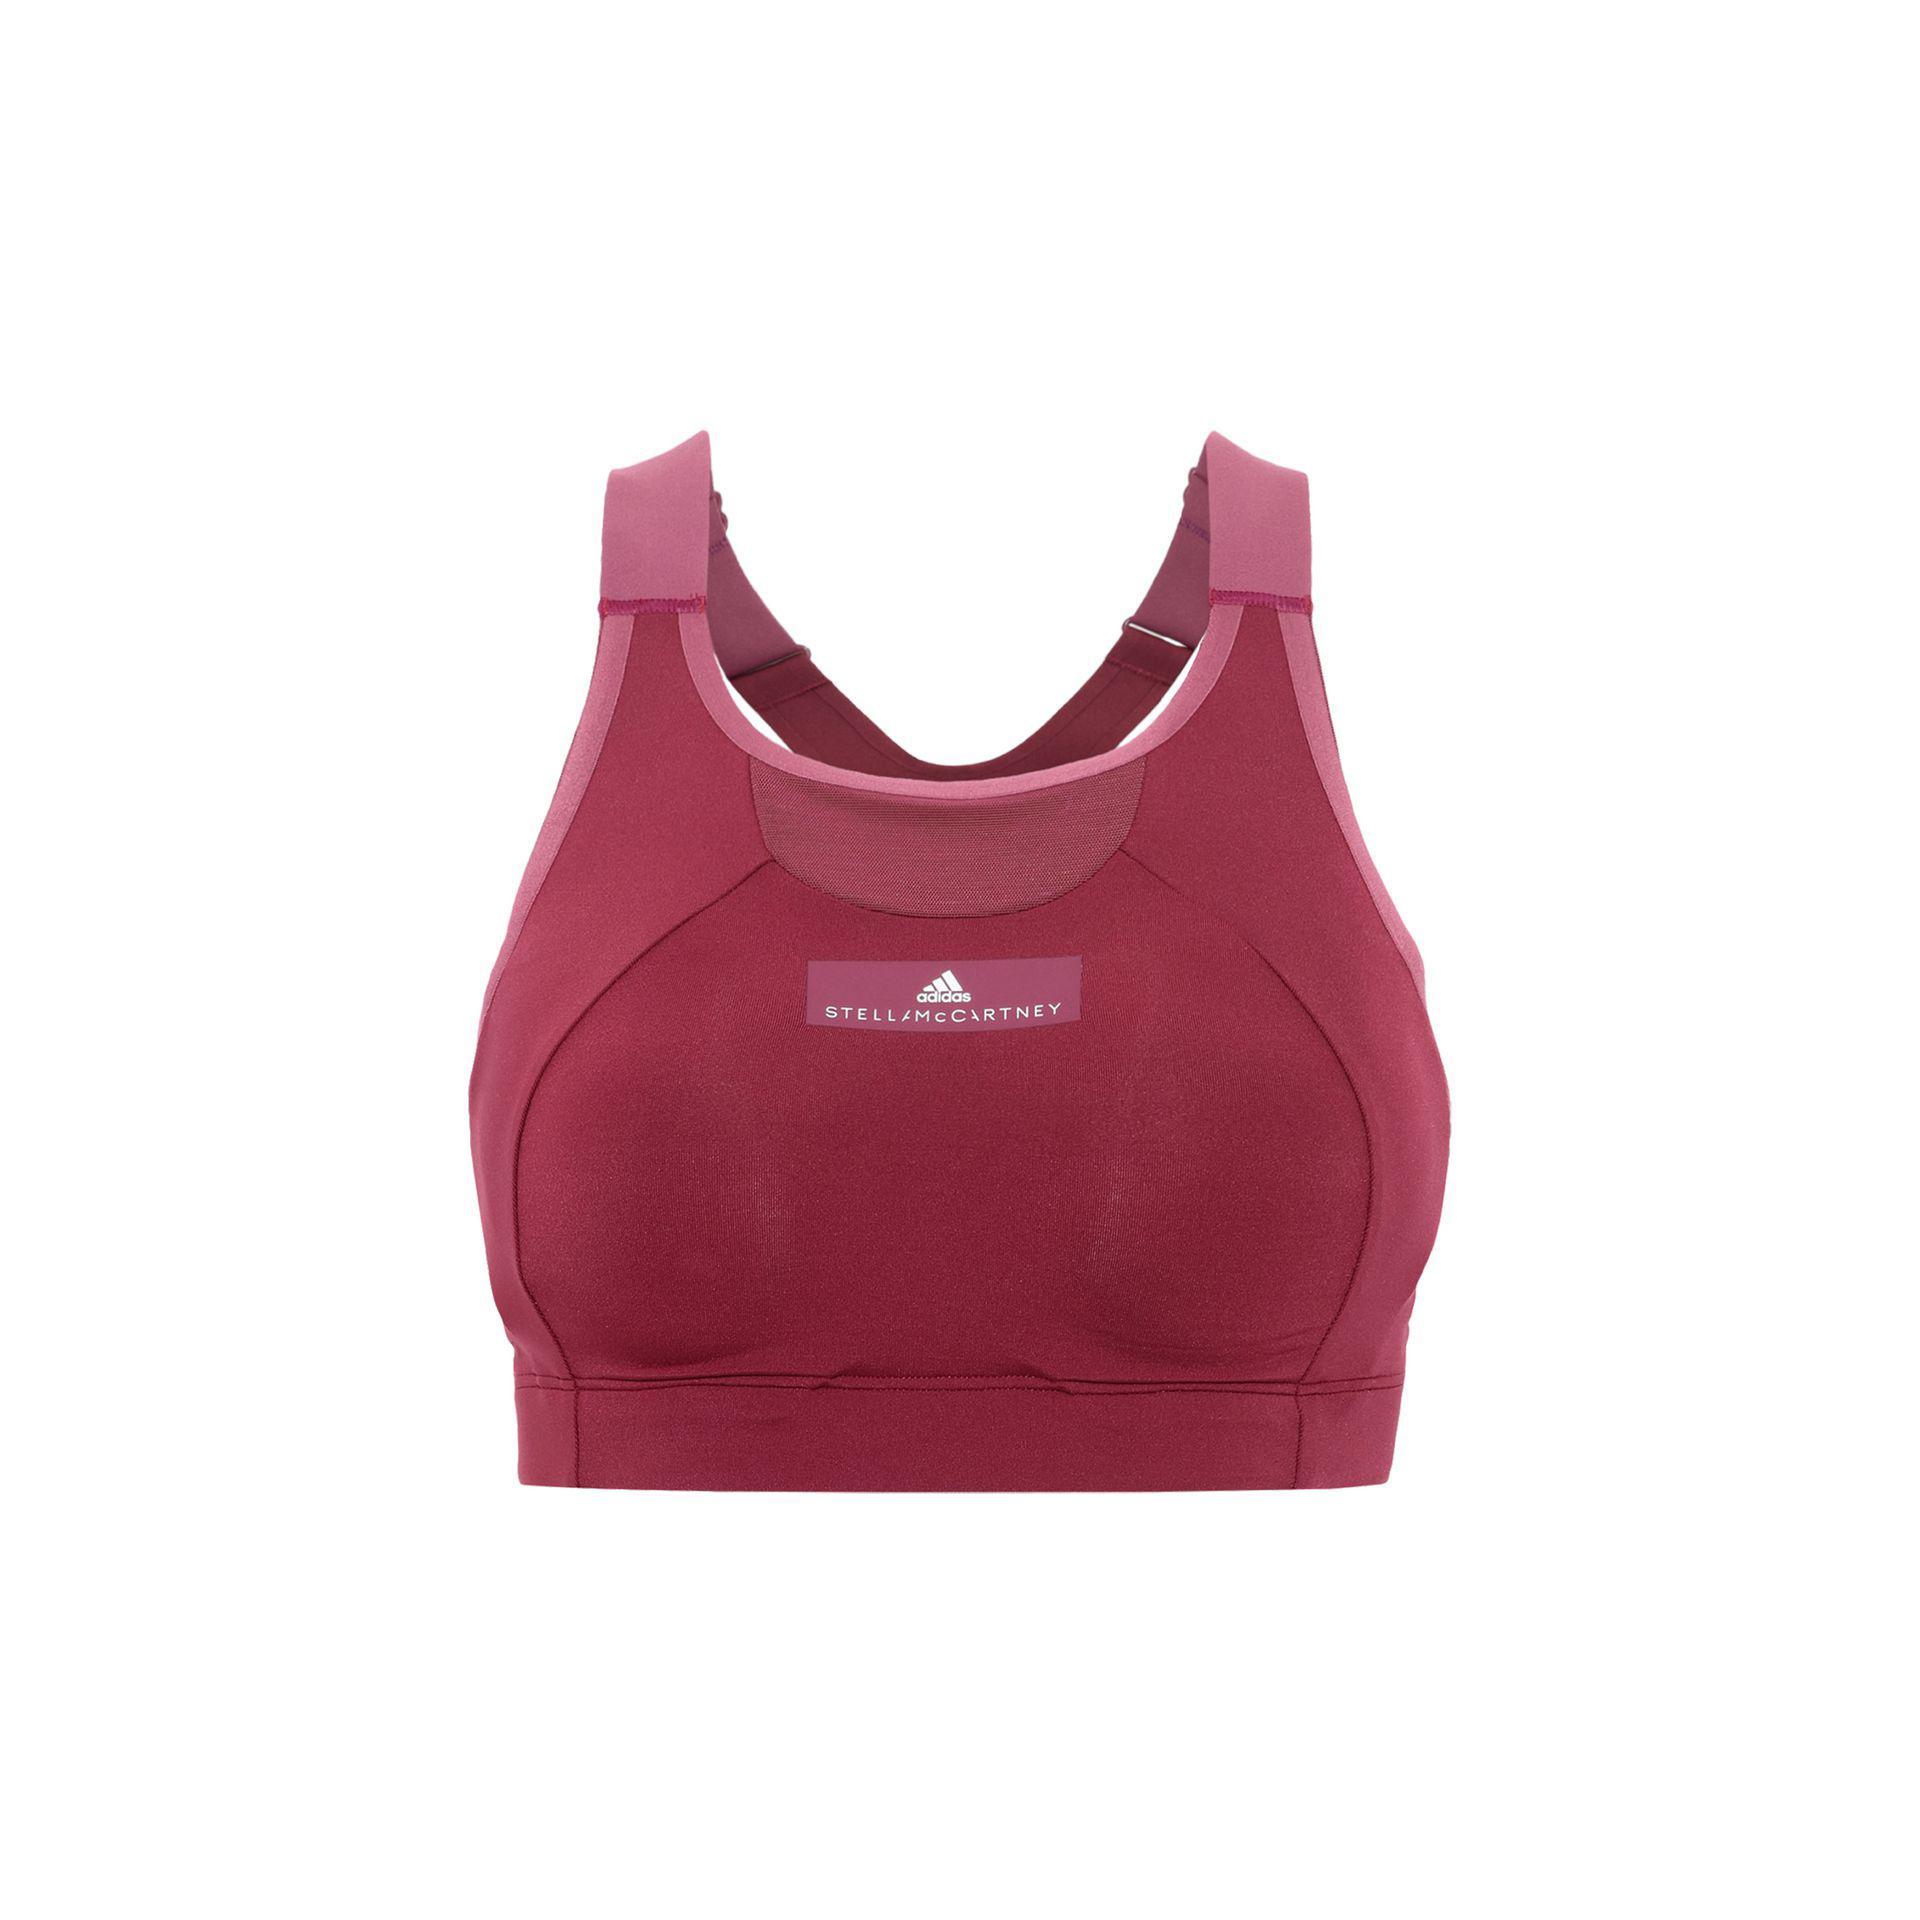 22ecc84613 Lyst - Adidas By Stella Mccartney Red Cmmttd Sports Bra in Red